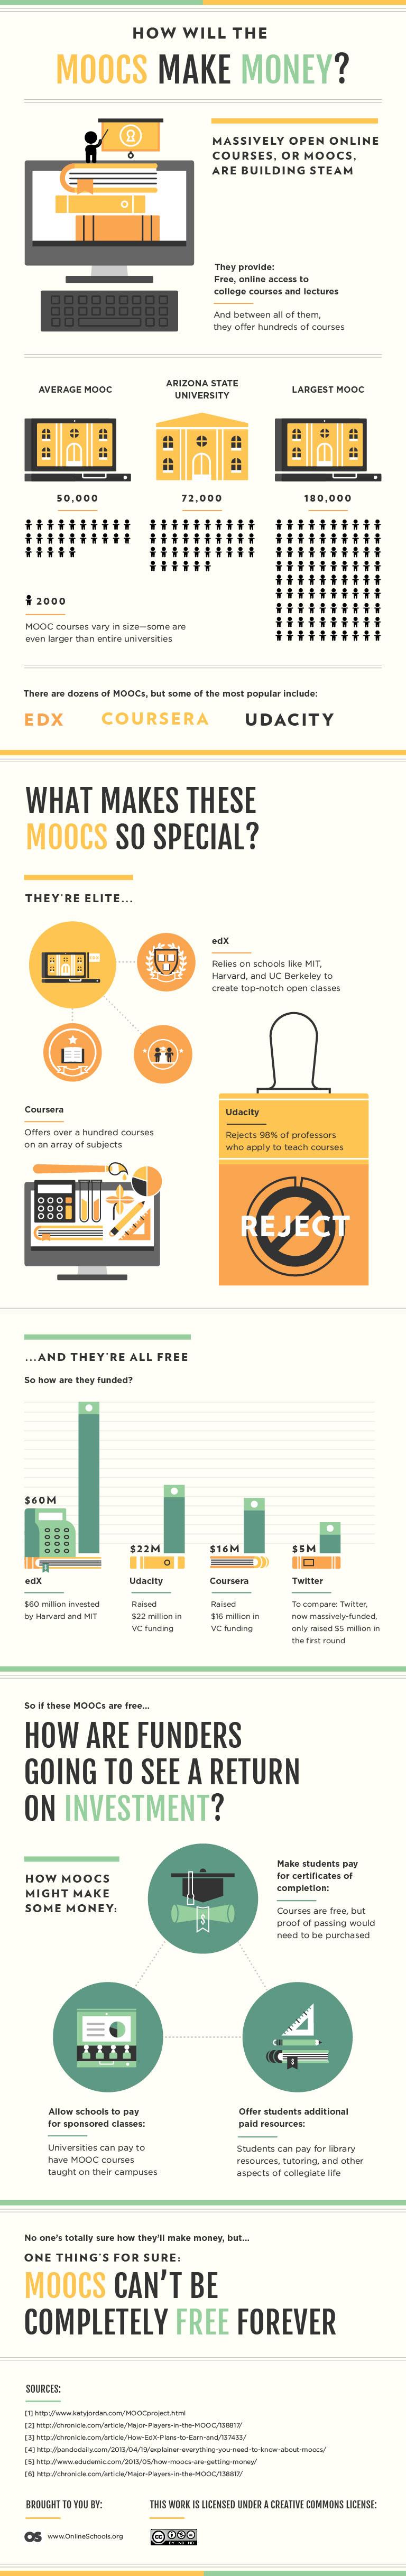 mook-money-info-graphic.jpg